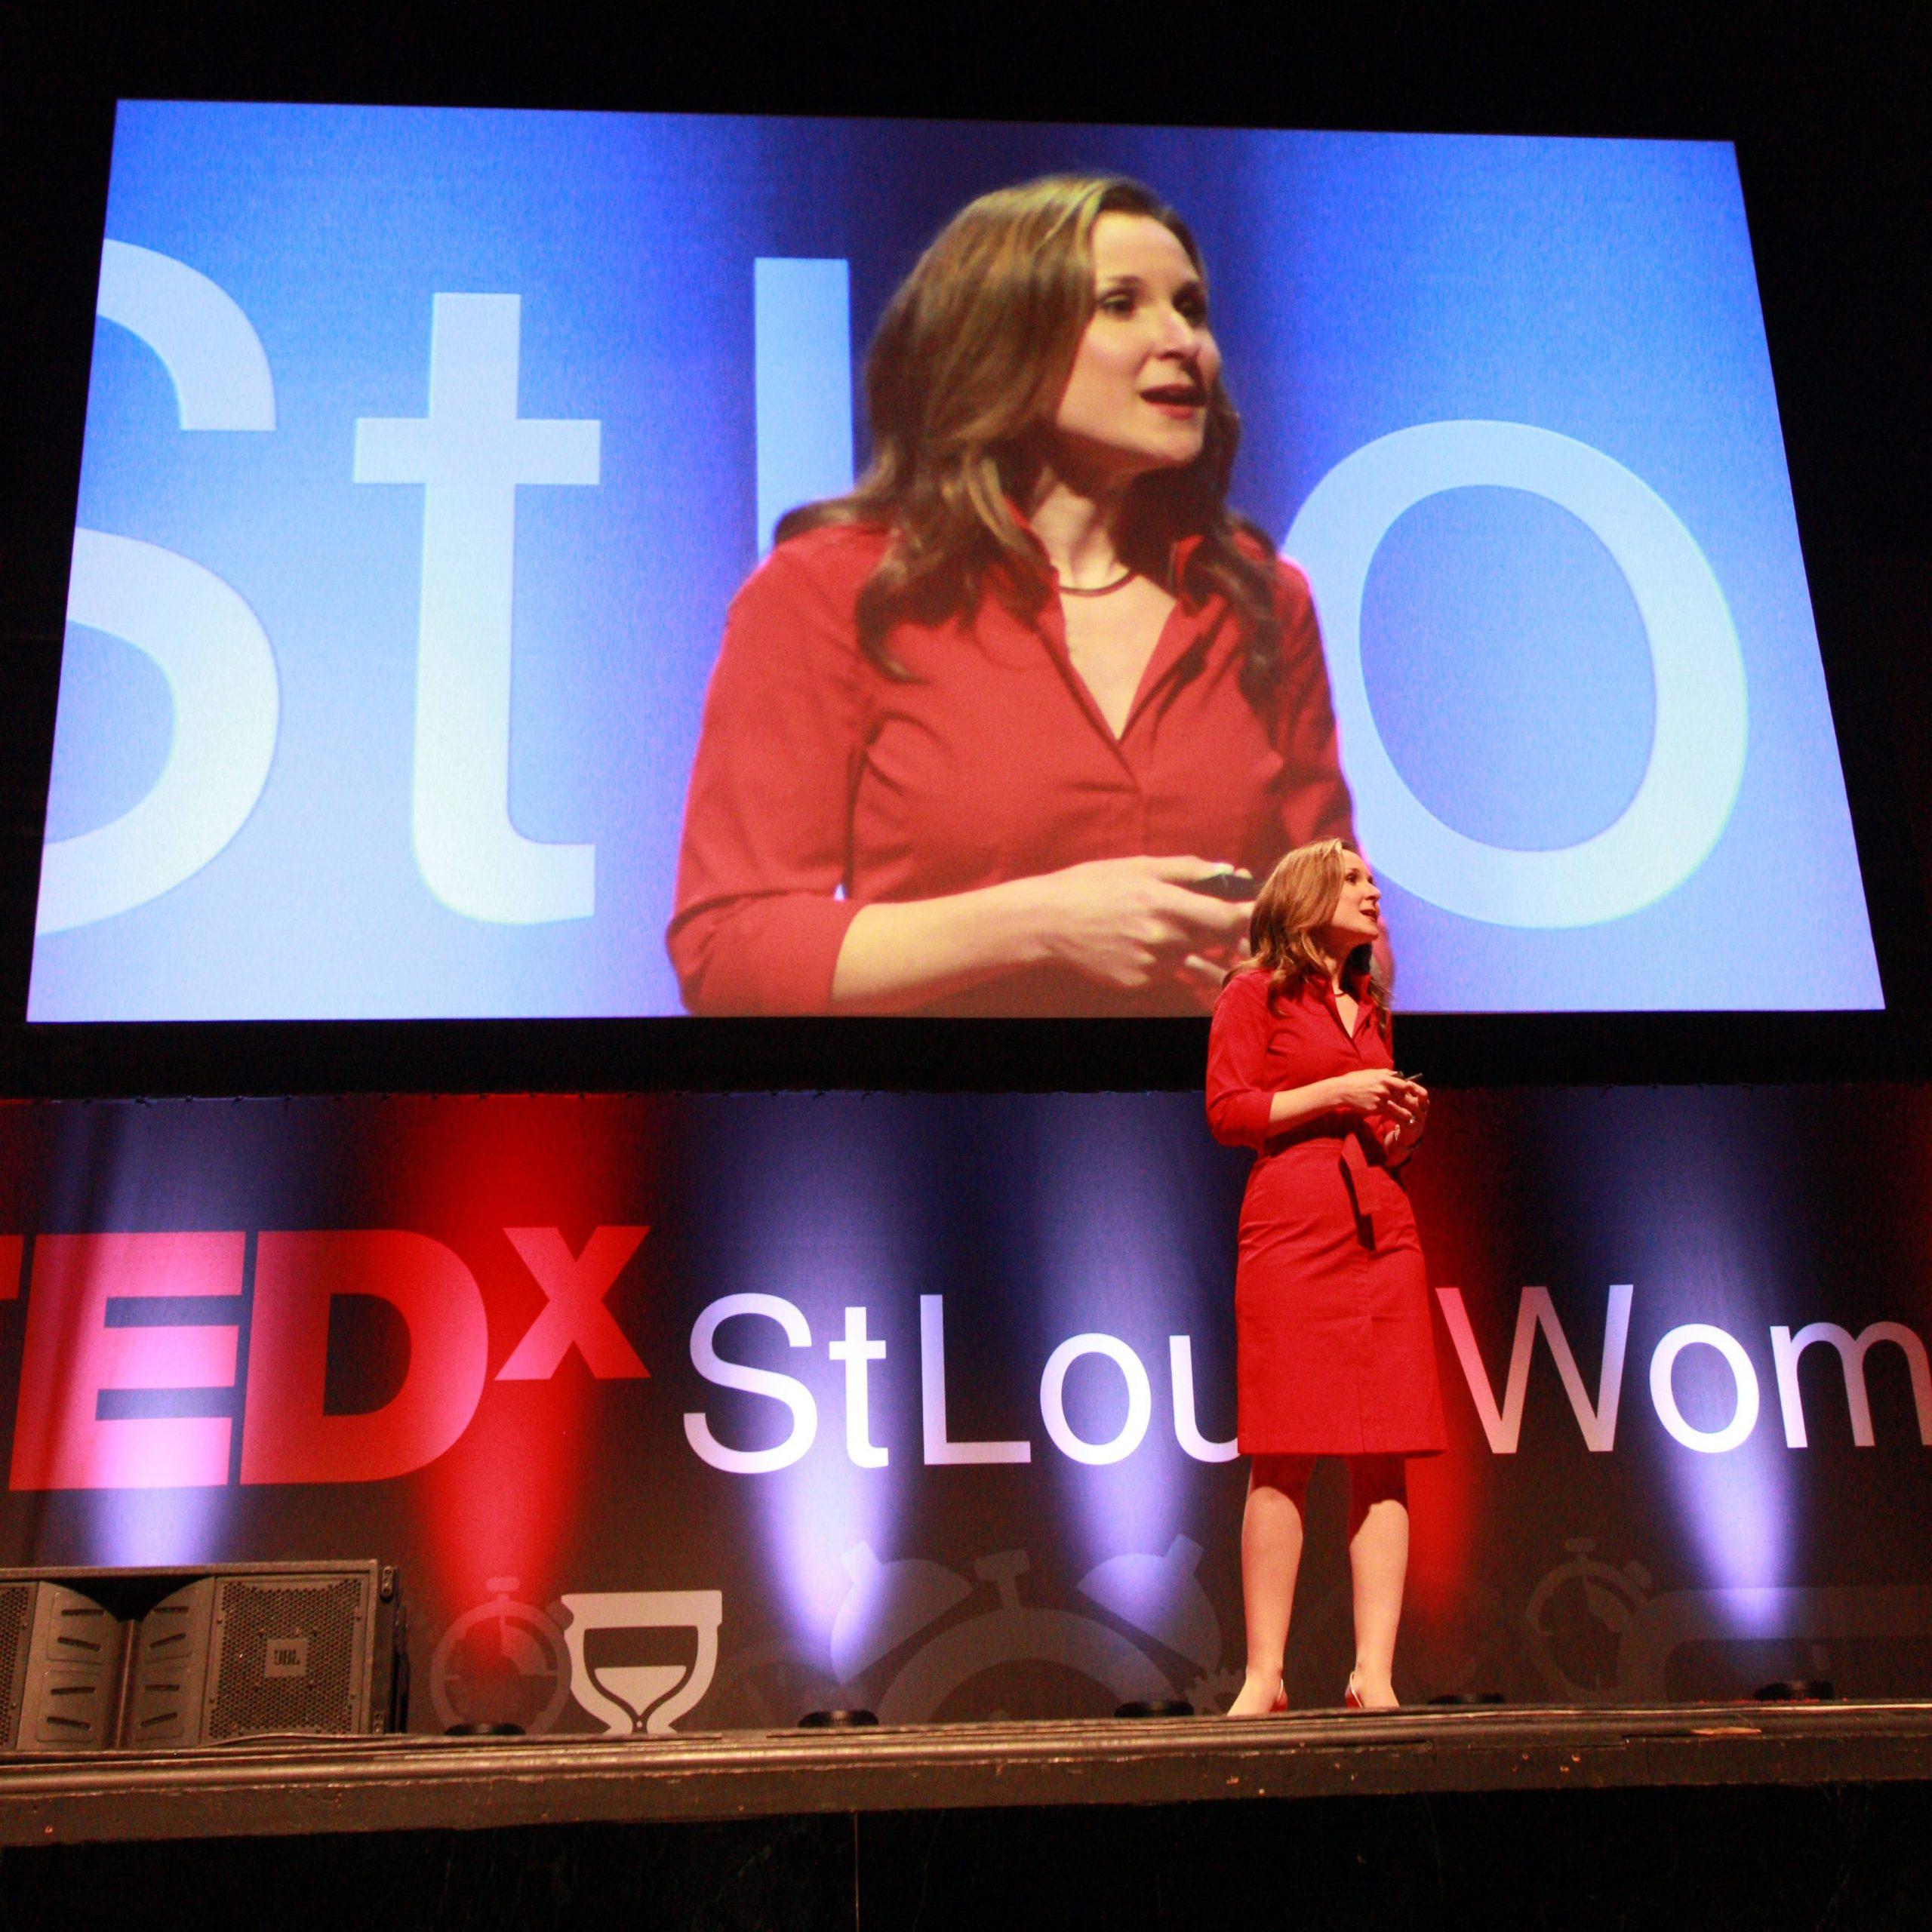 Let's stop shaming millennials - TEDx Talk